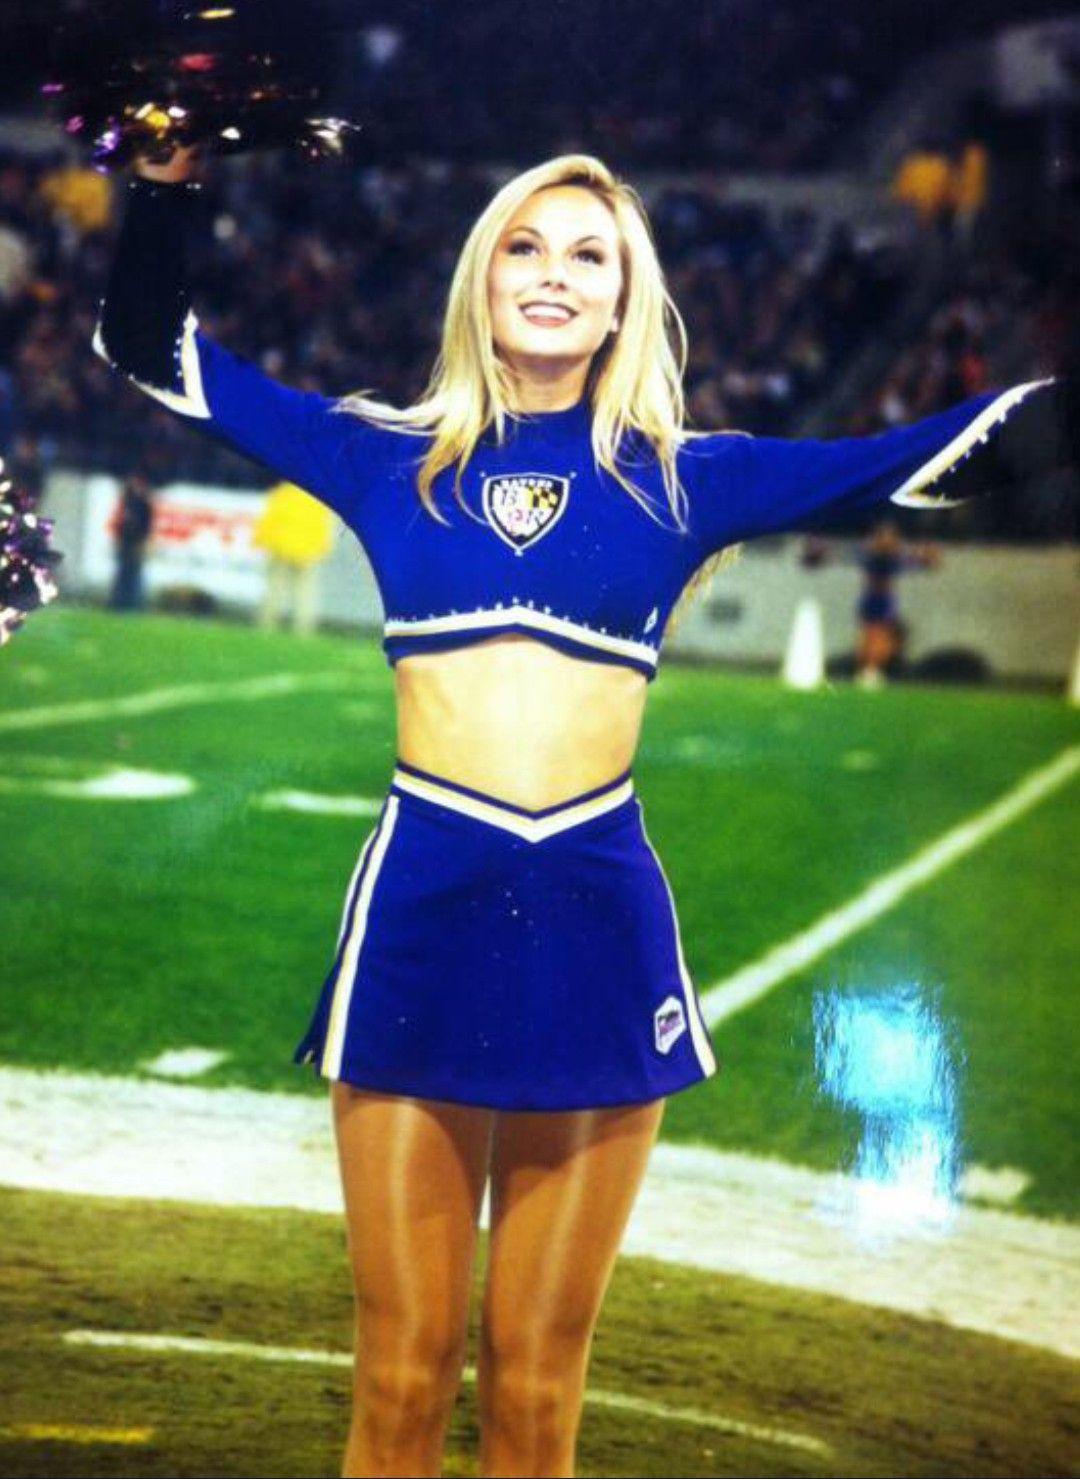 Stacy Kiebler In 2020 Stacy Keibler Ravens Cheerleaders Cheerleading